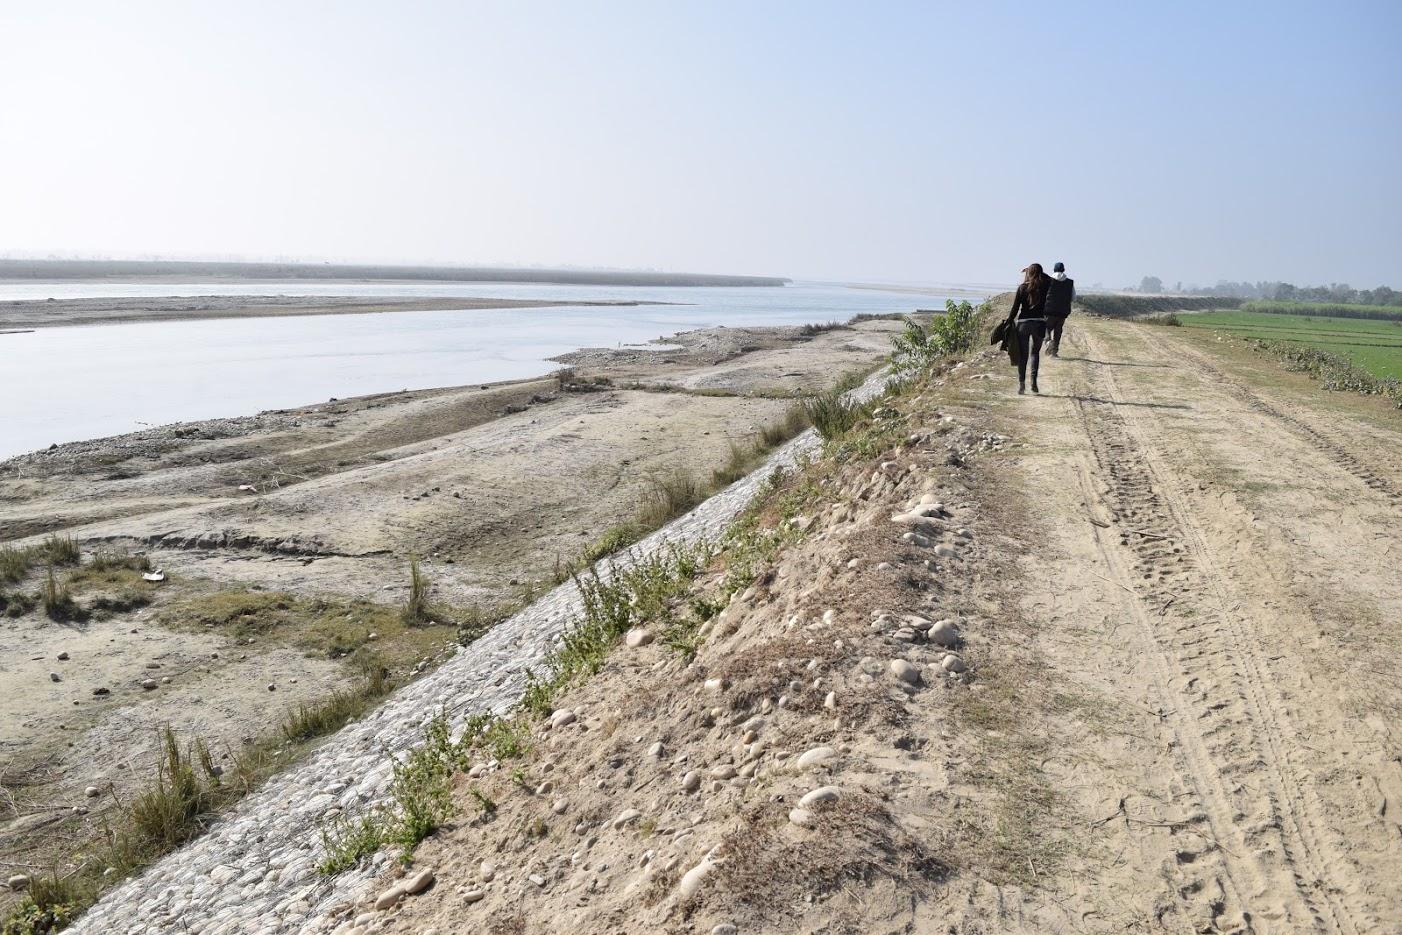 Scanning for Ganges River Dolphins along the Karnali River, Nepal